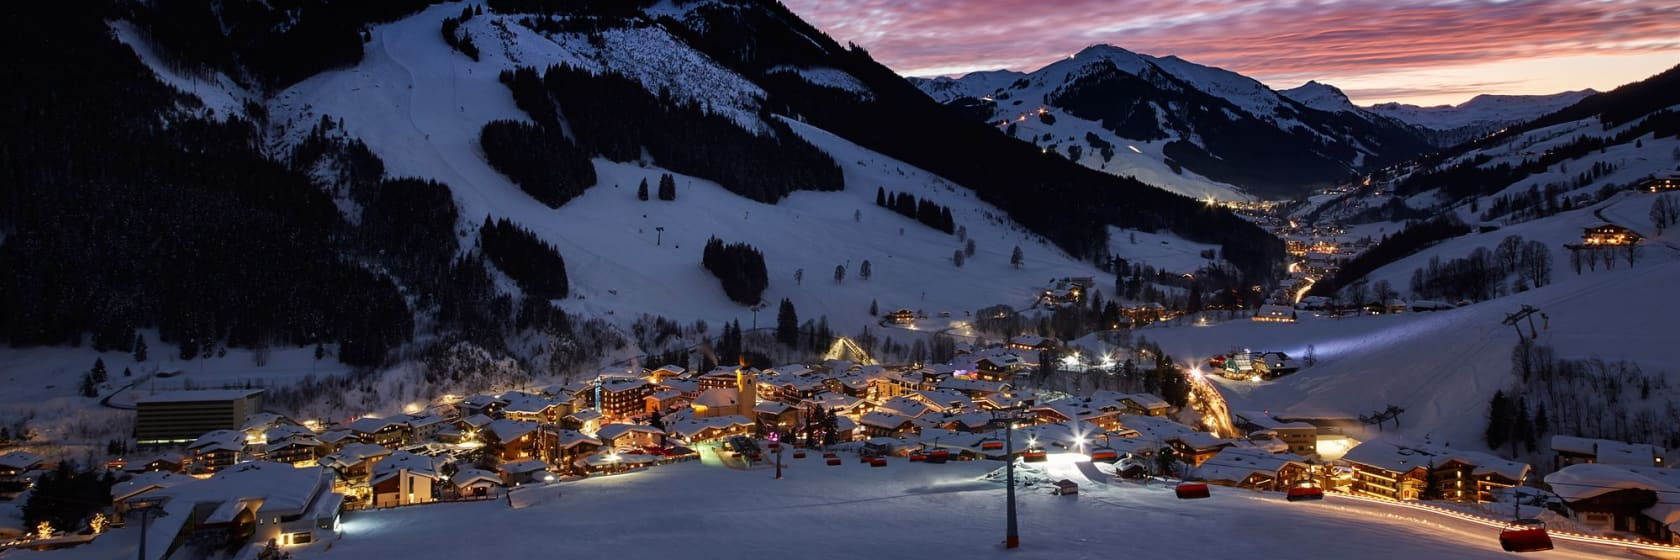 Skisports om natten med lyse i husene i Østrig